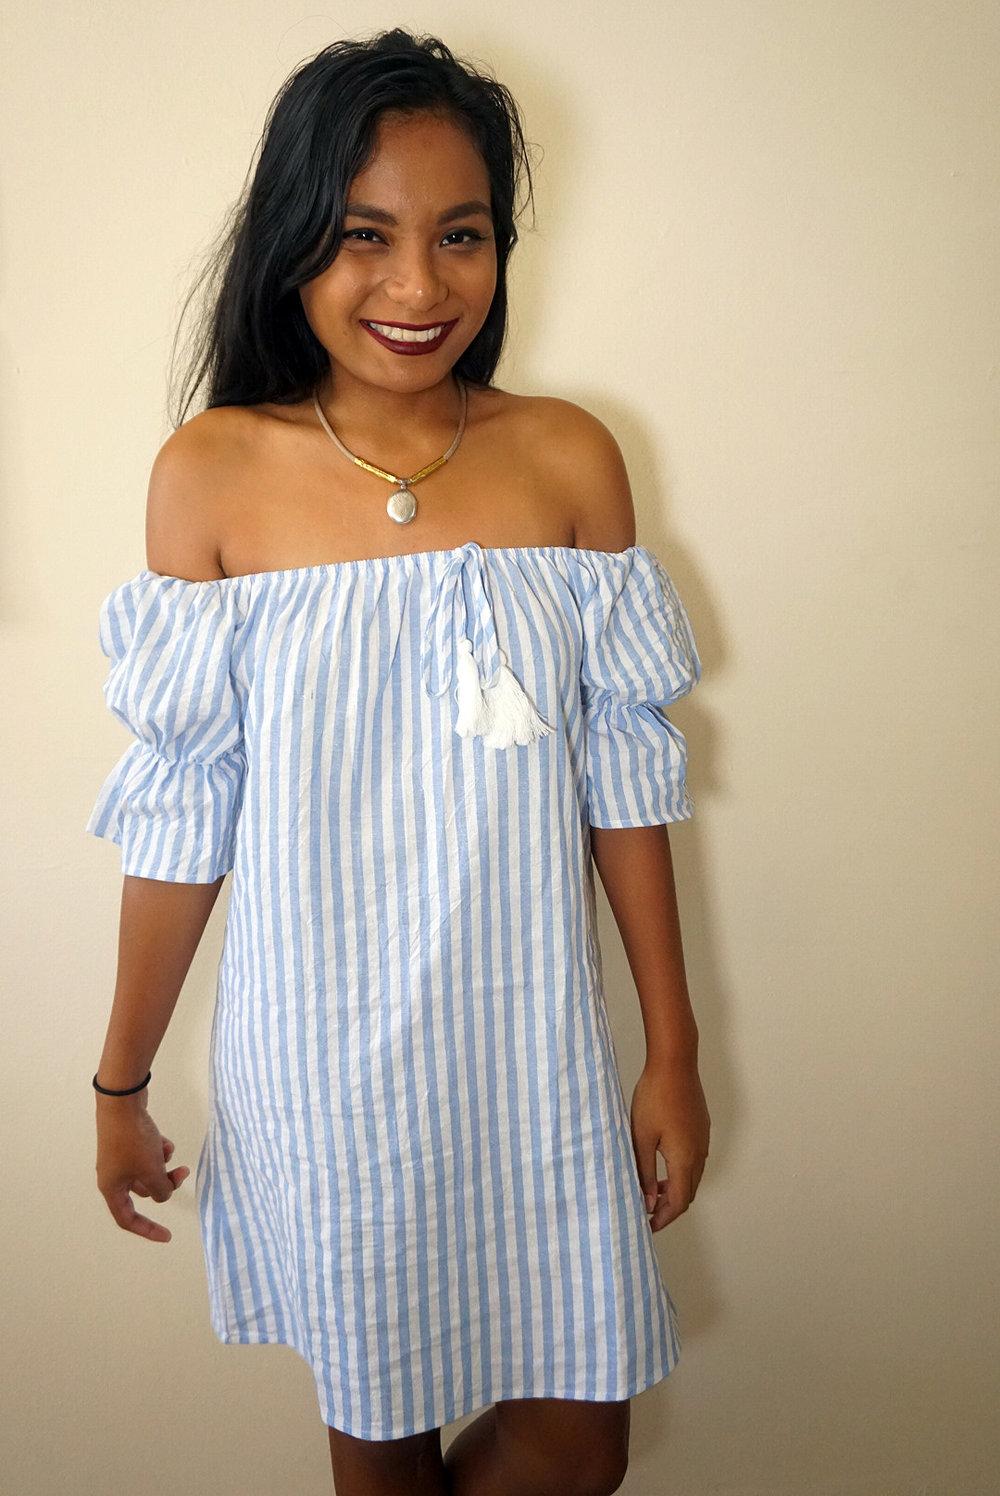 Off-the-shoulder-striped-dress-summer-fall-style-blogger-LINDATENCHITRAN-8-1616x1080.jpg